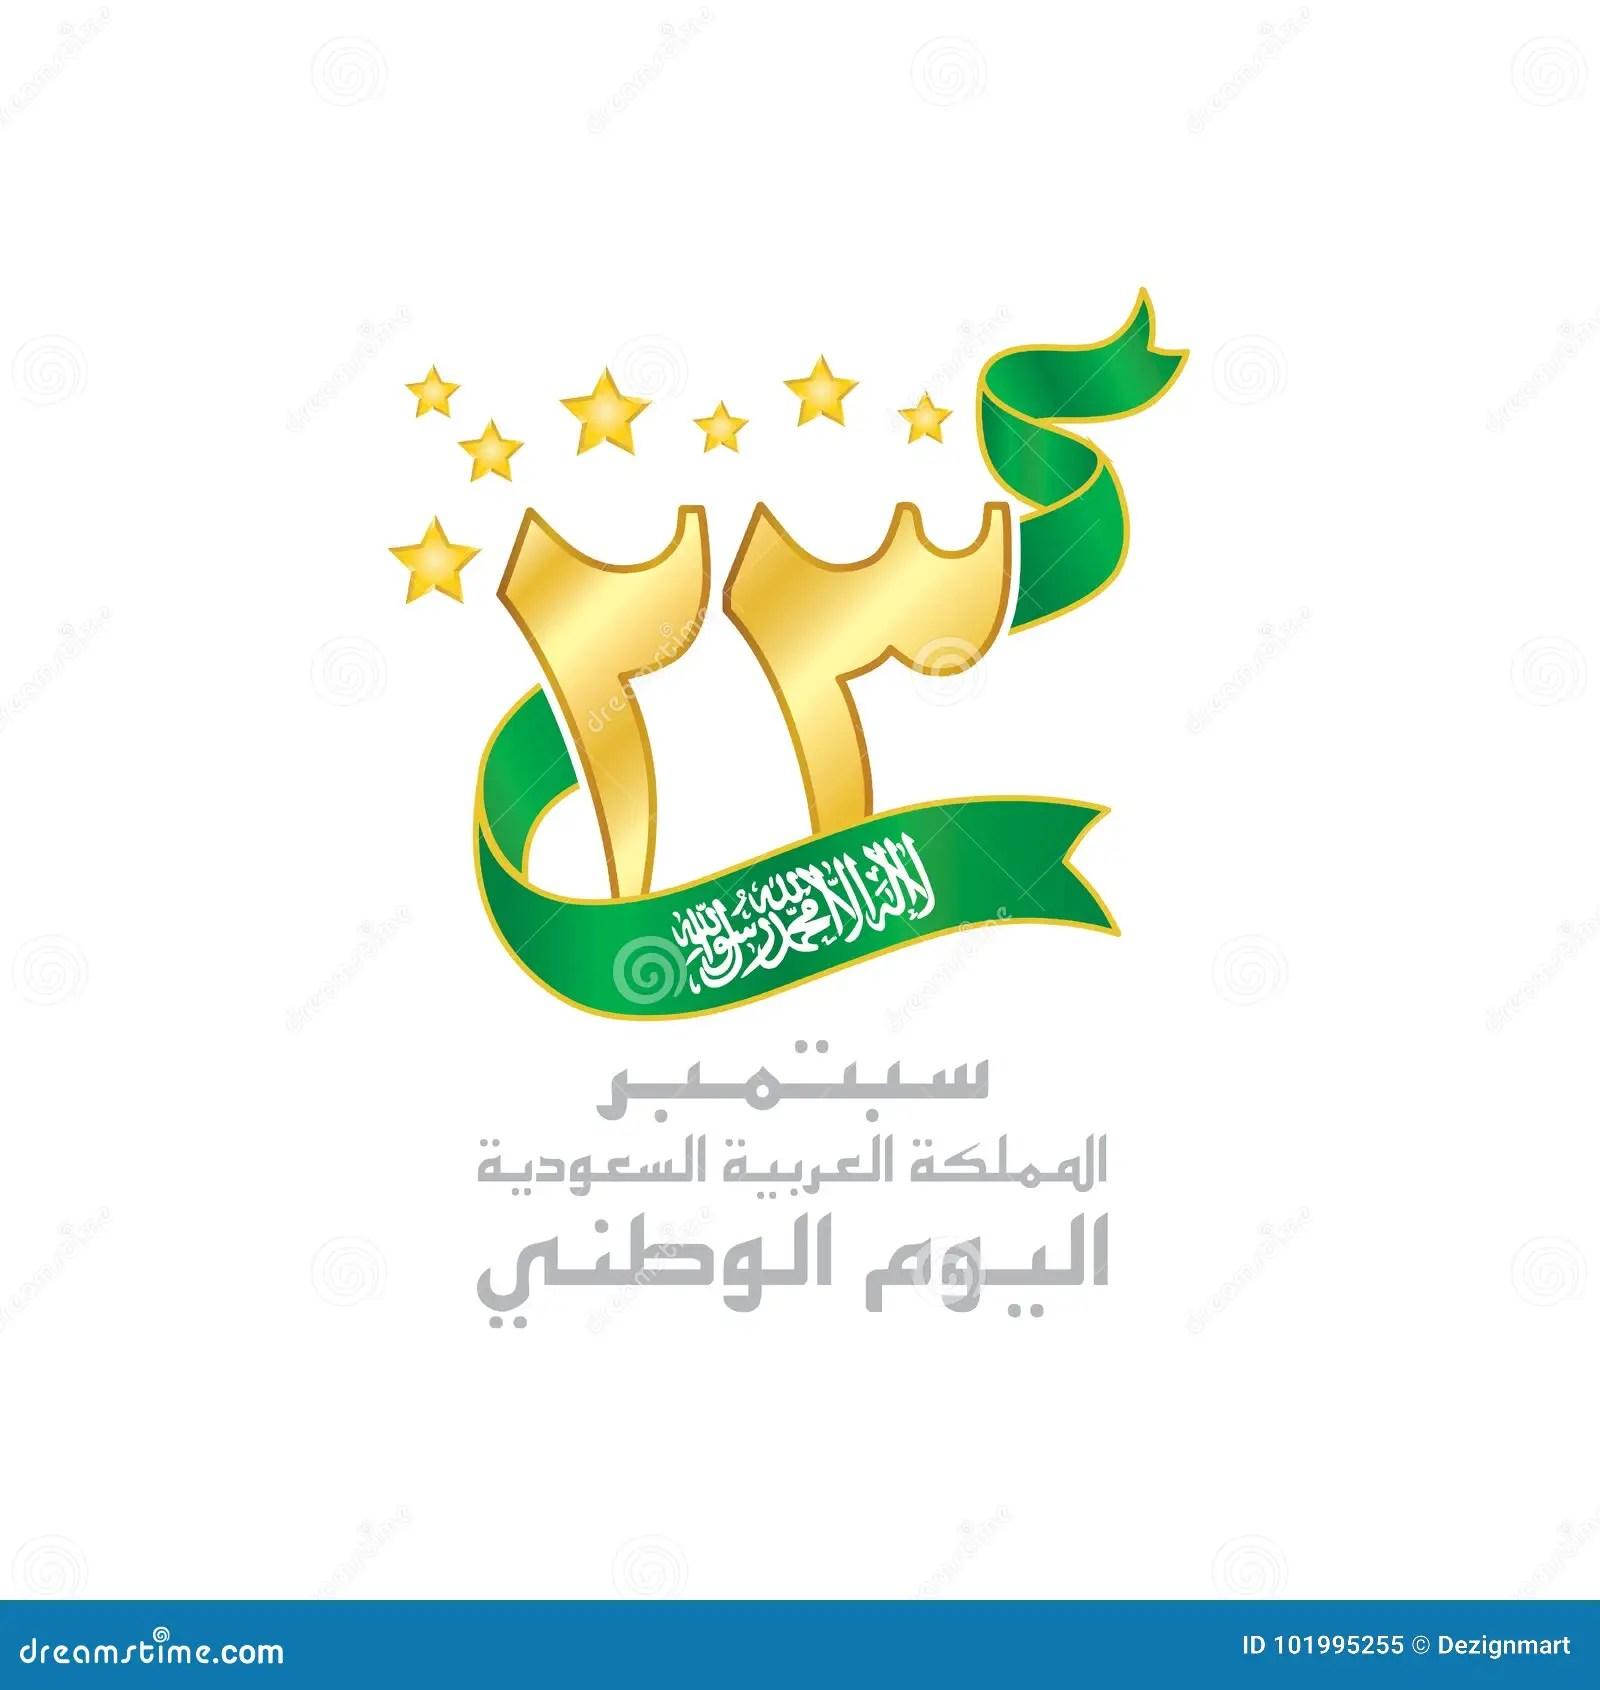 Saudi Arabia National Day Logo Stock Vector Illustration Of